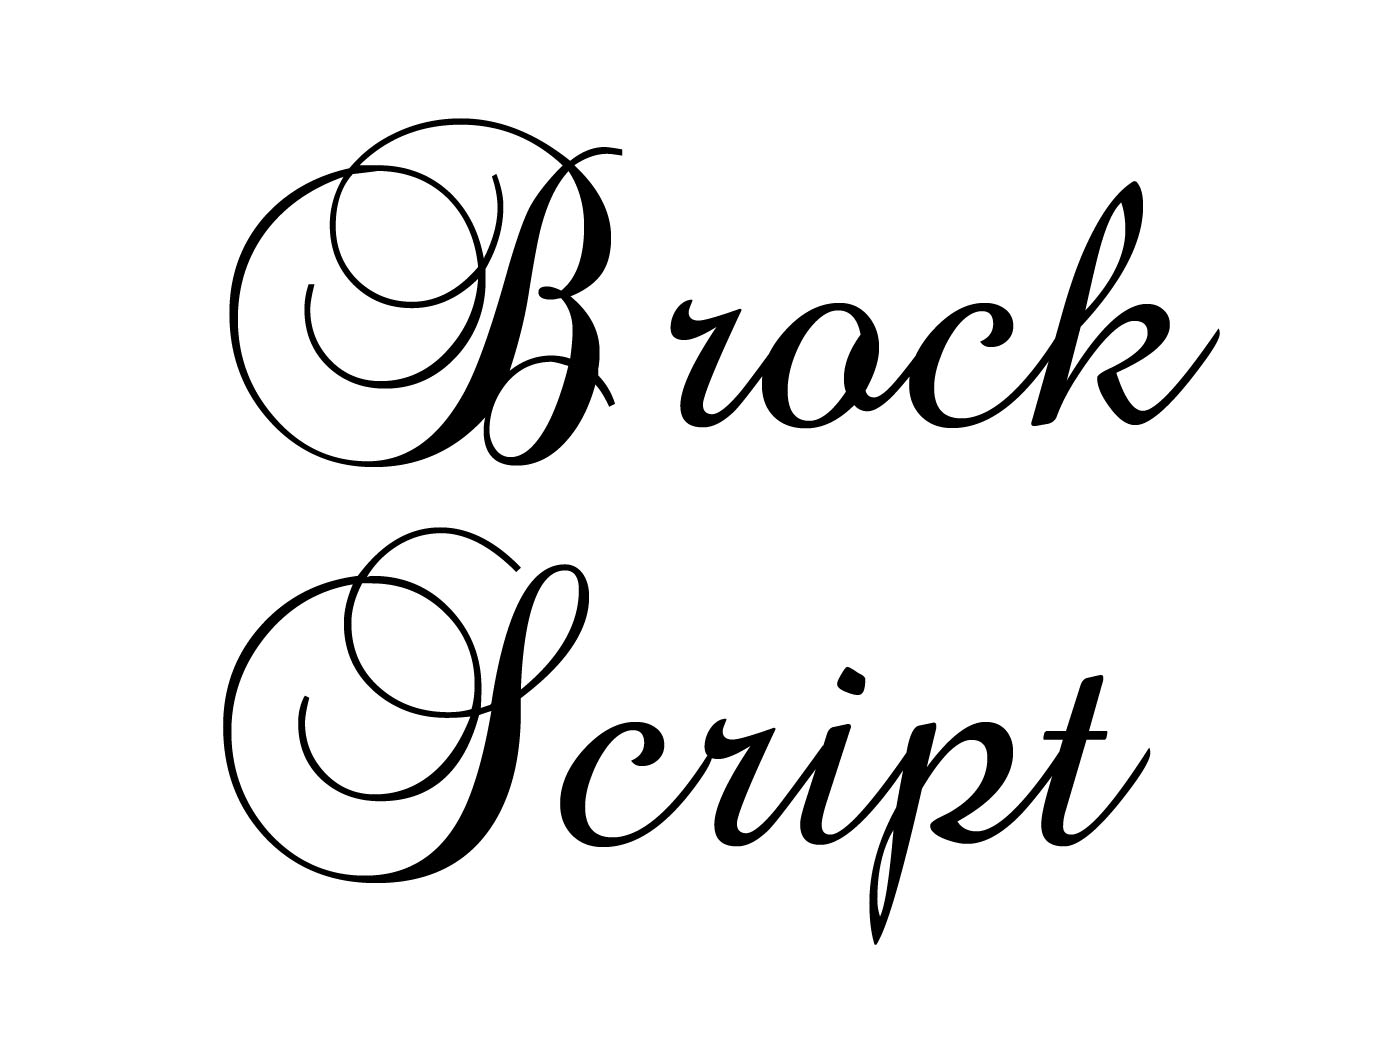 Fancy Letter C Fonts 14 Free Fancy Cursive ...